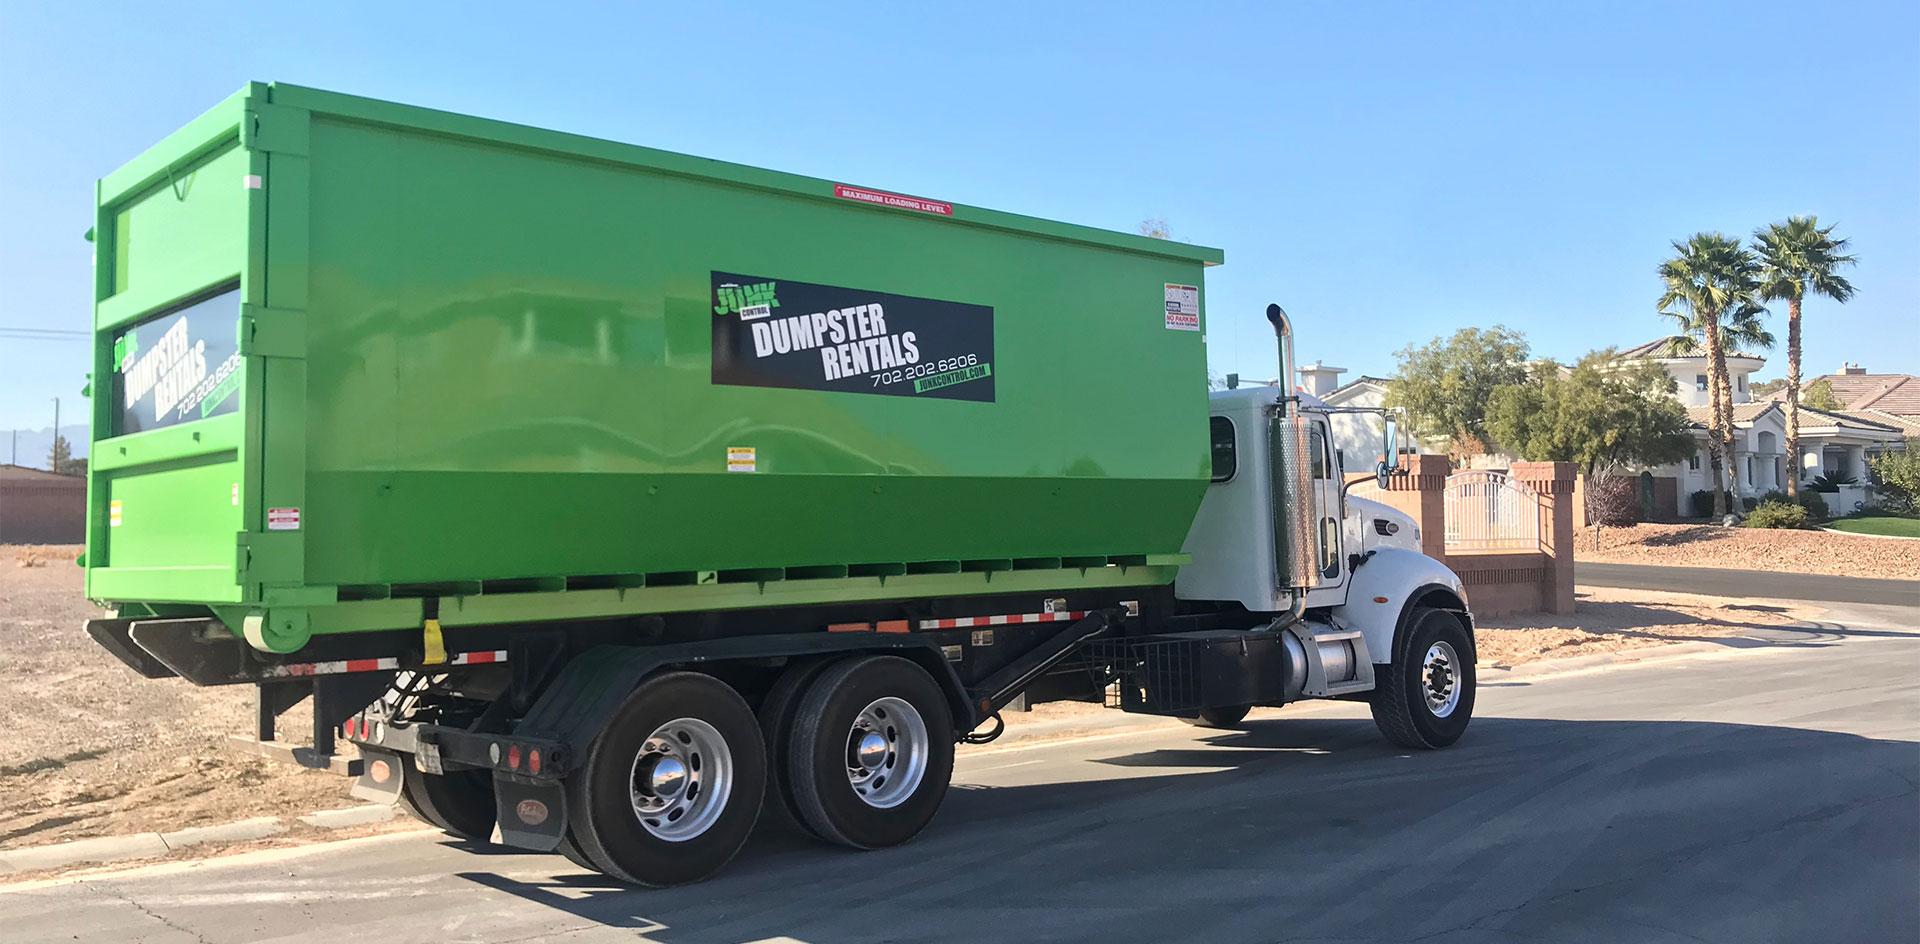 Junk Control Las Vegas - Top 5 Reasons To Choose Junk Control Dumpster Rentals In Las Vegas